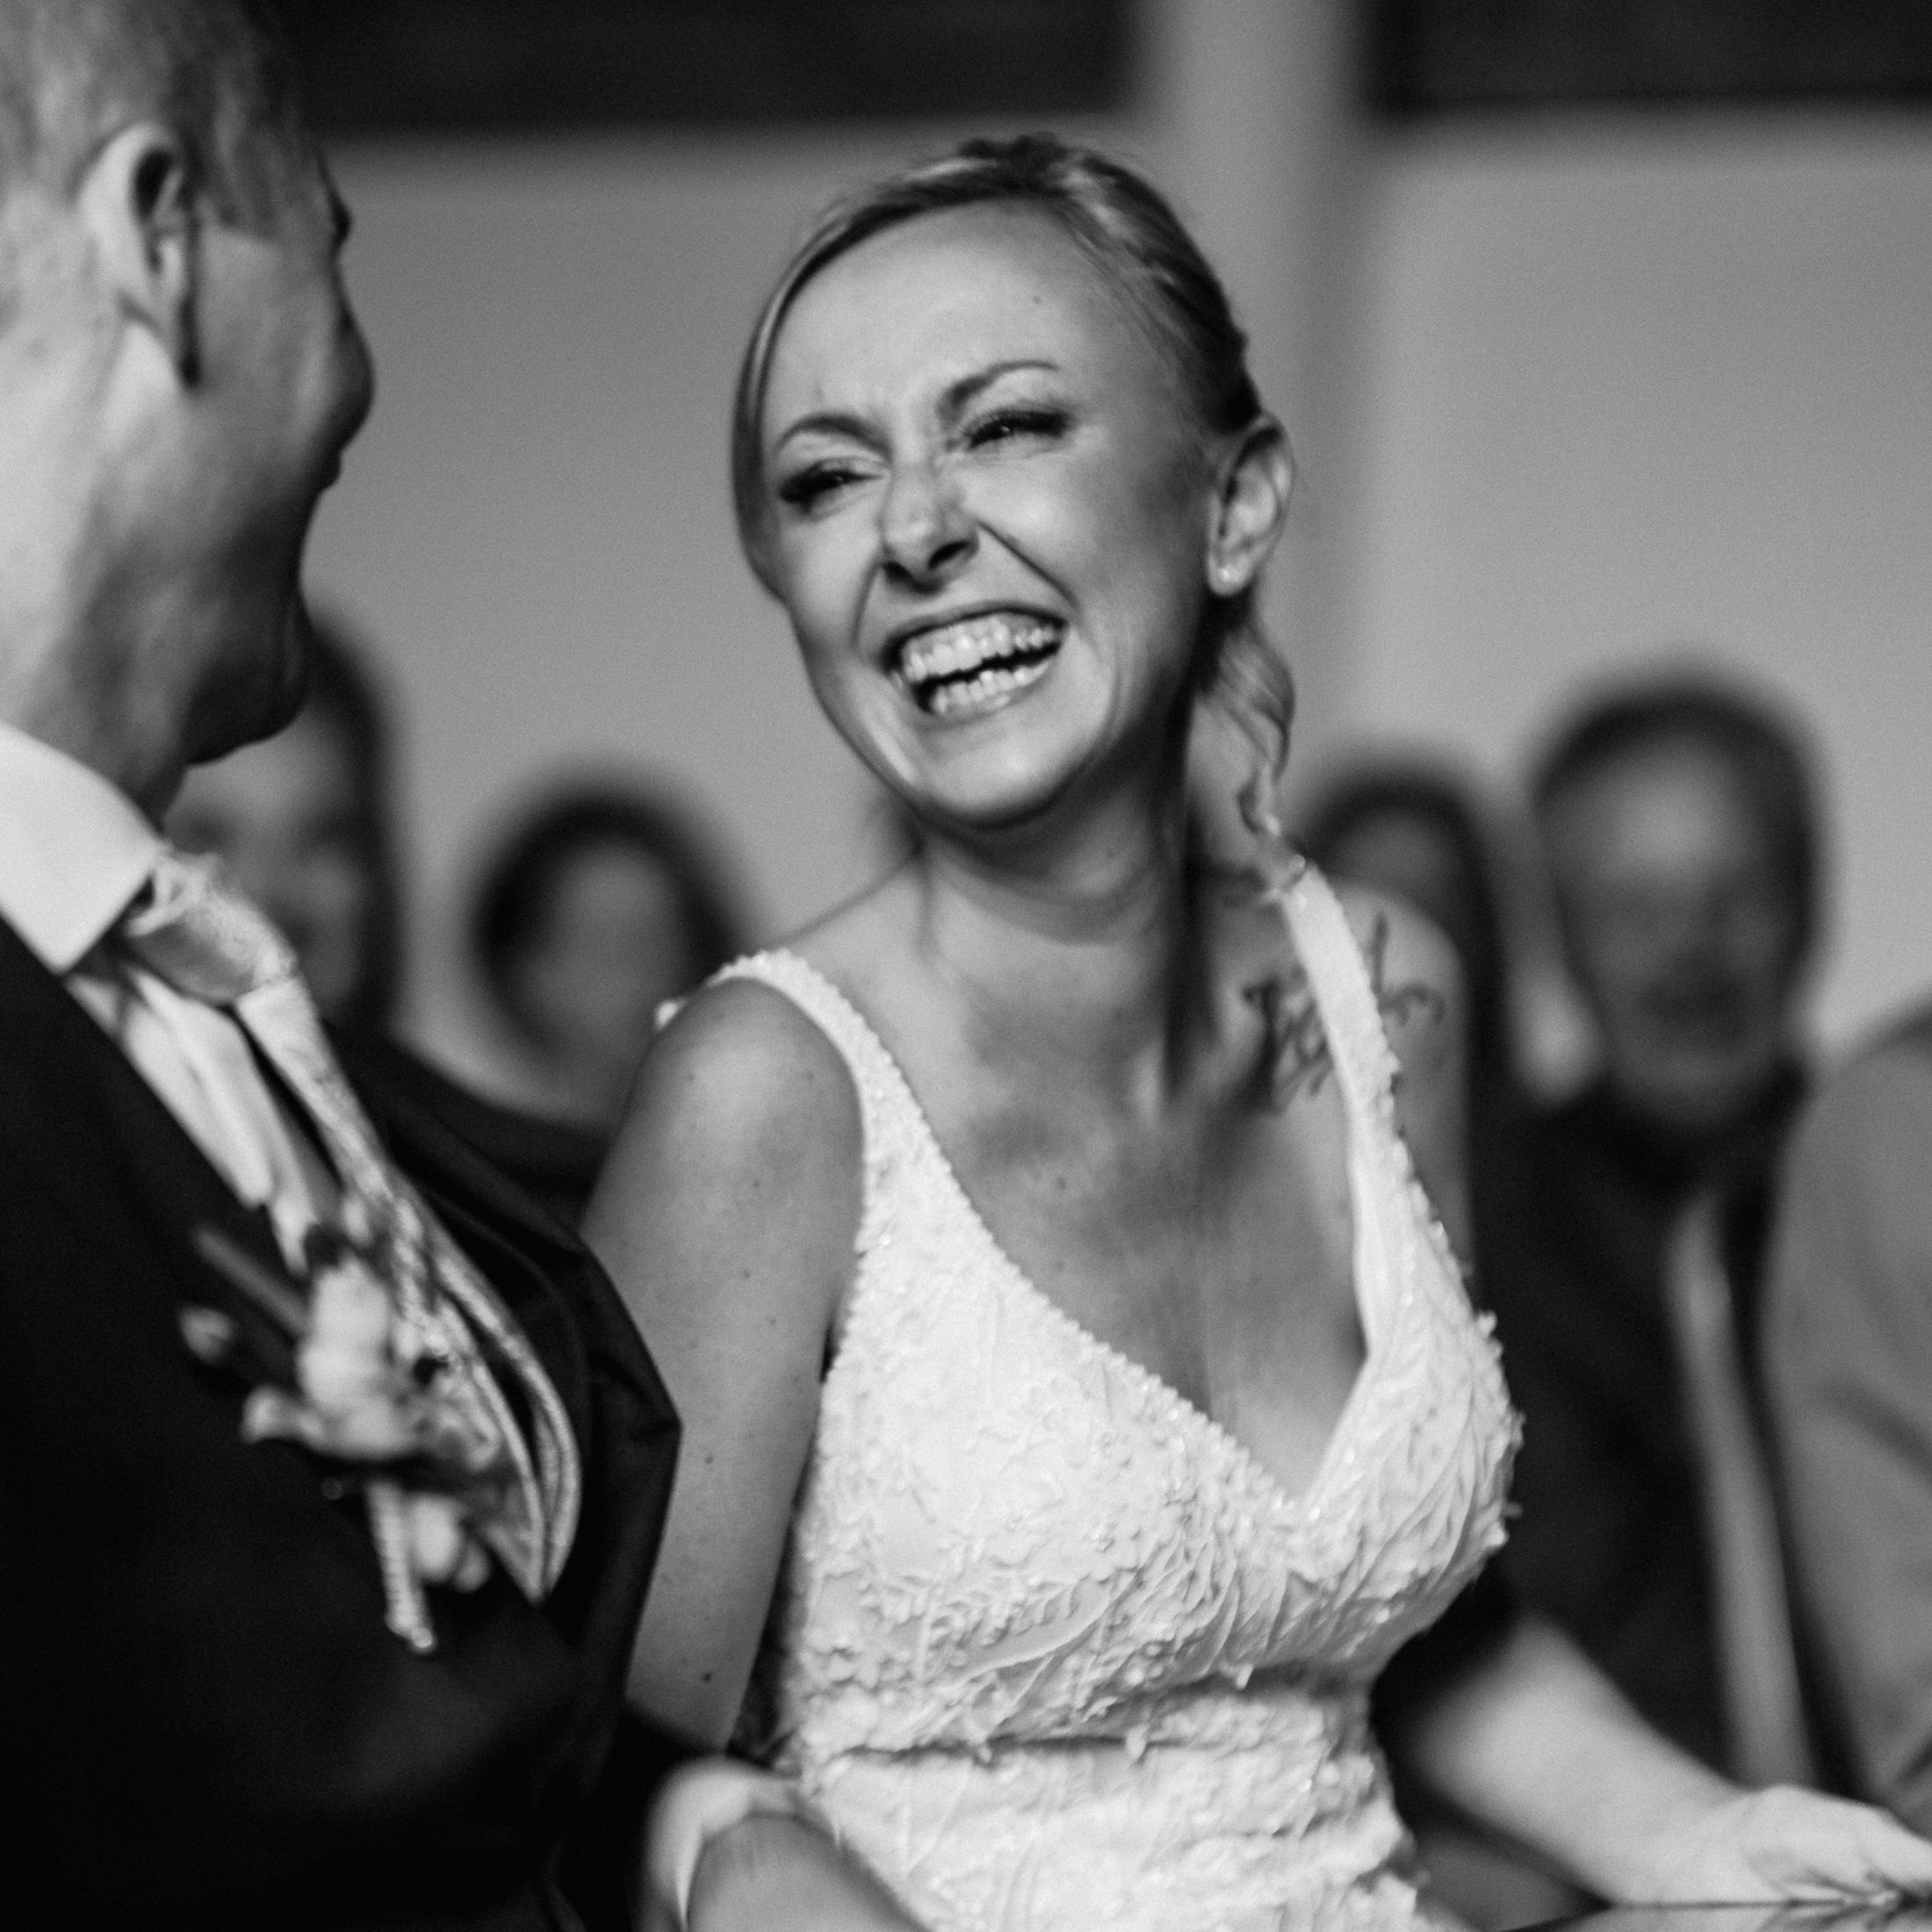 SebastianDon-Hochzeitsfotograf-Wien Umgebung-19.jpg